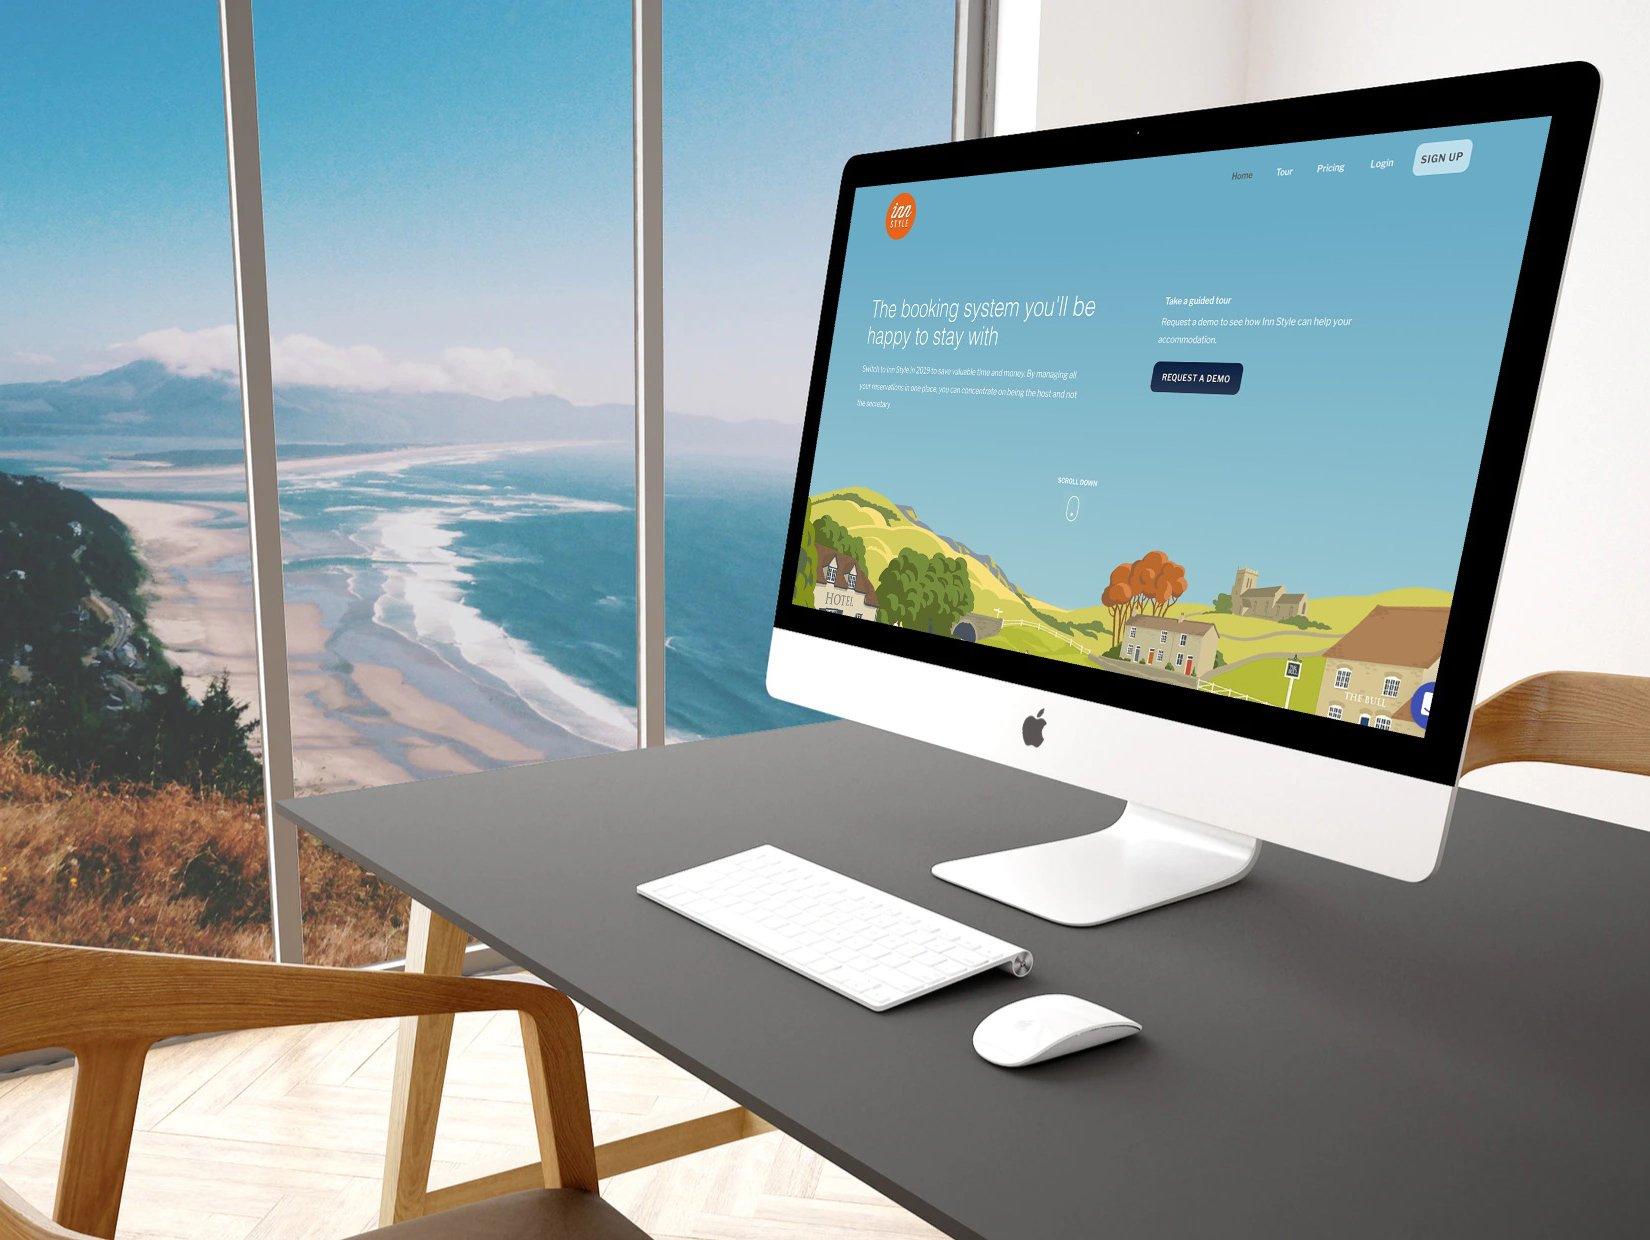 InnStyle website displayed on an iMac